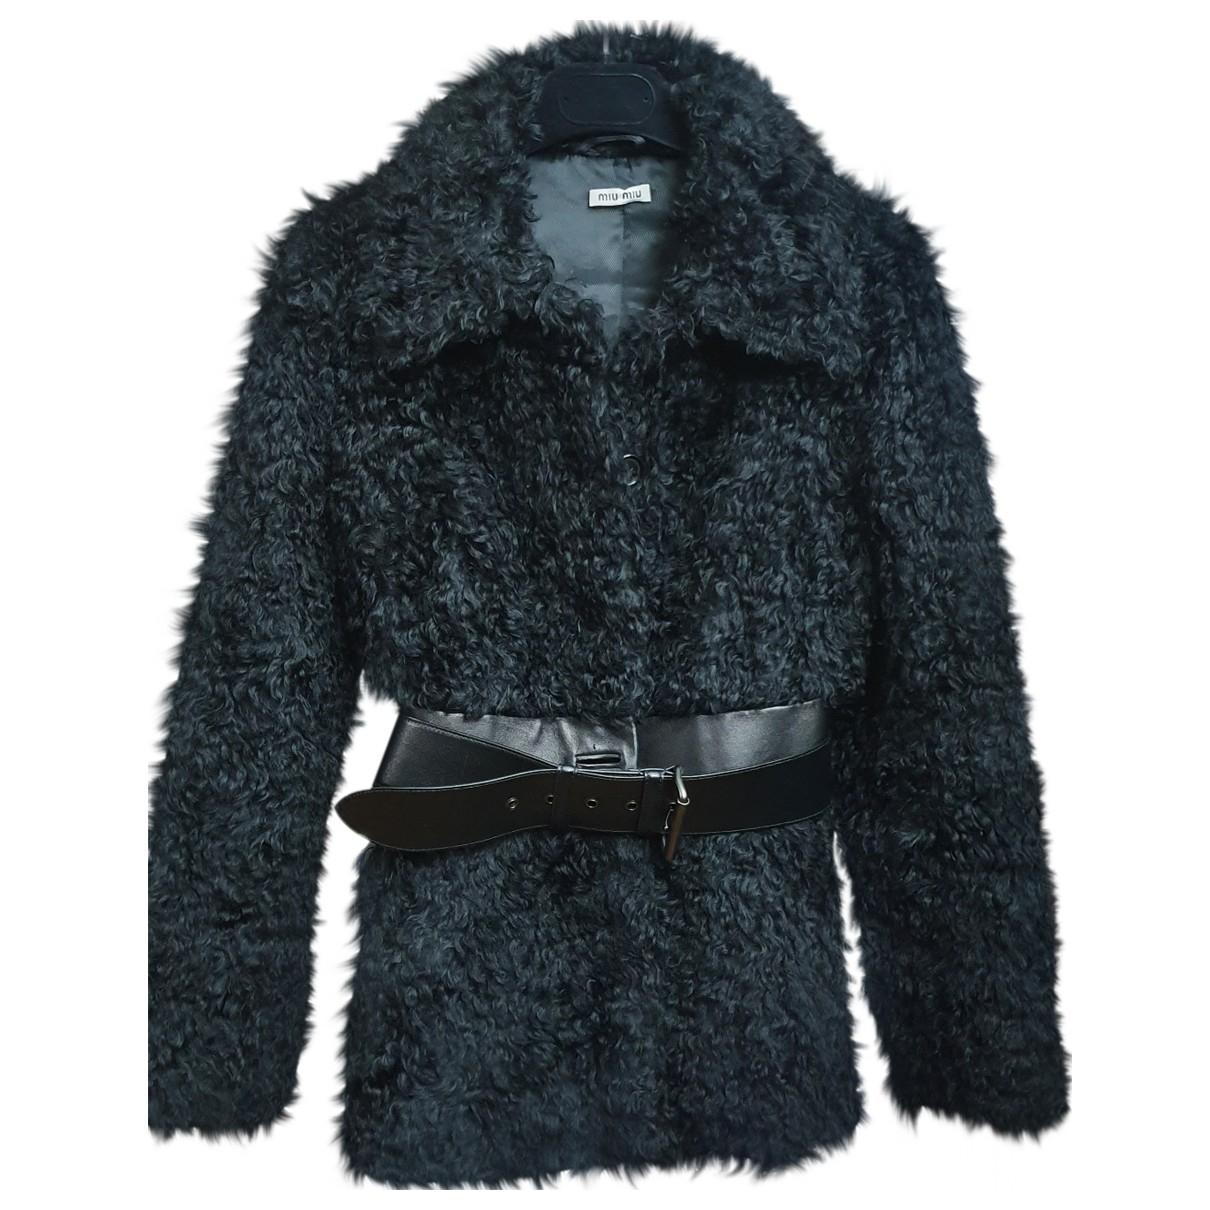 Miu Miu \N Black Wool coat for Women 40 IT